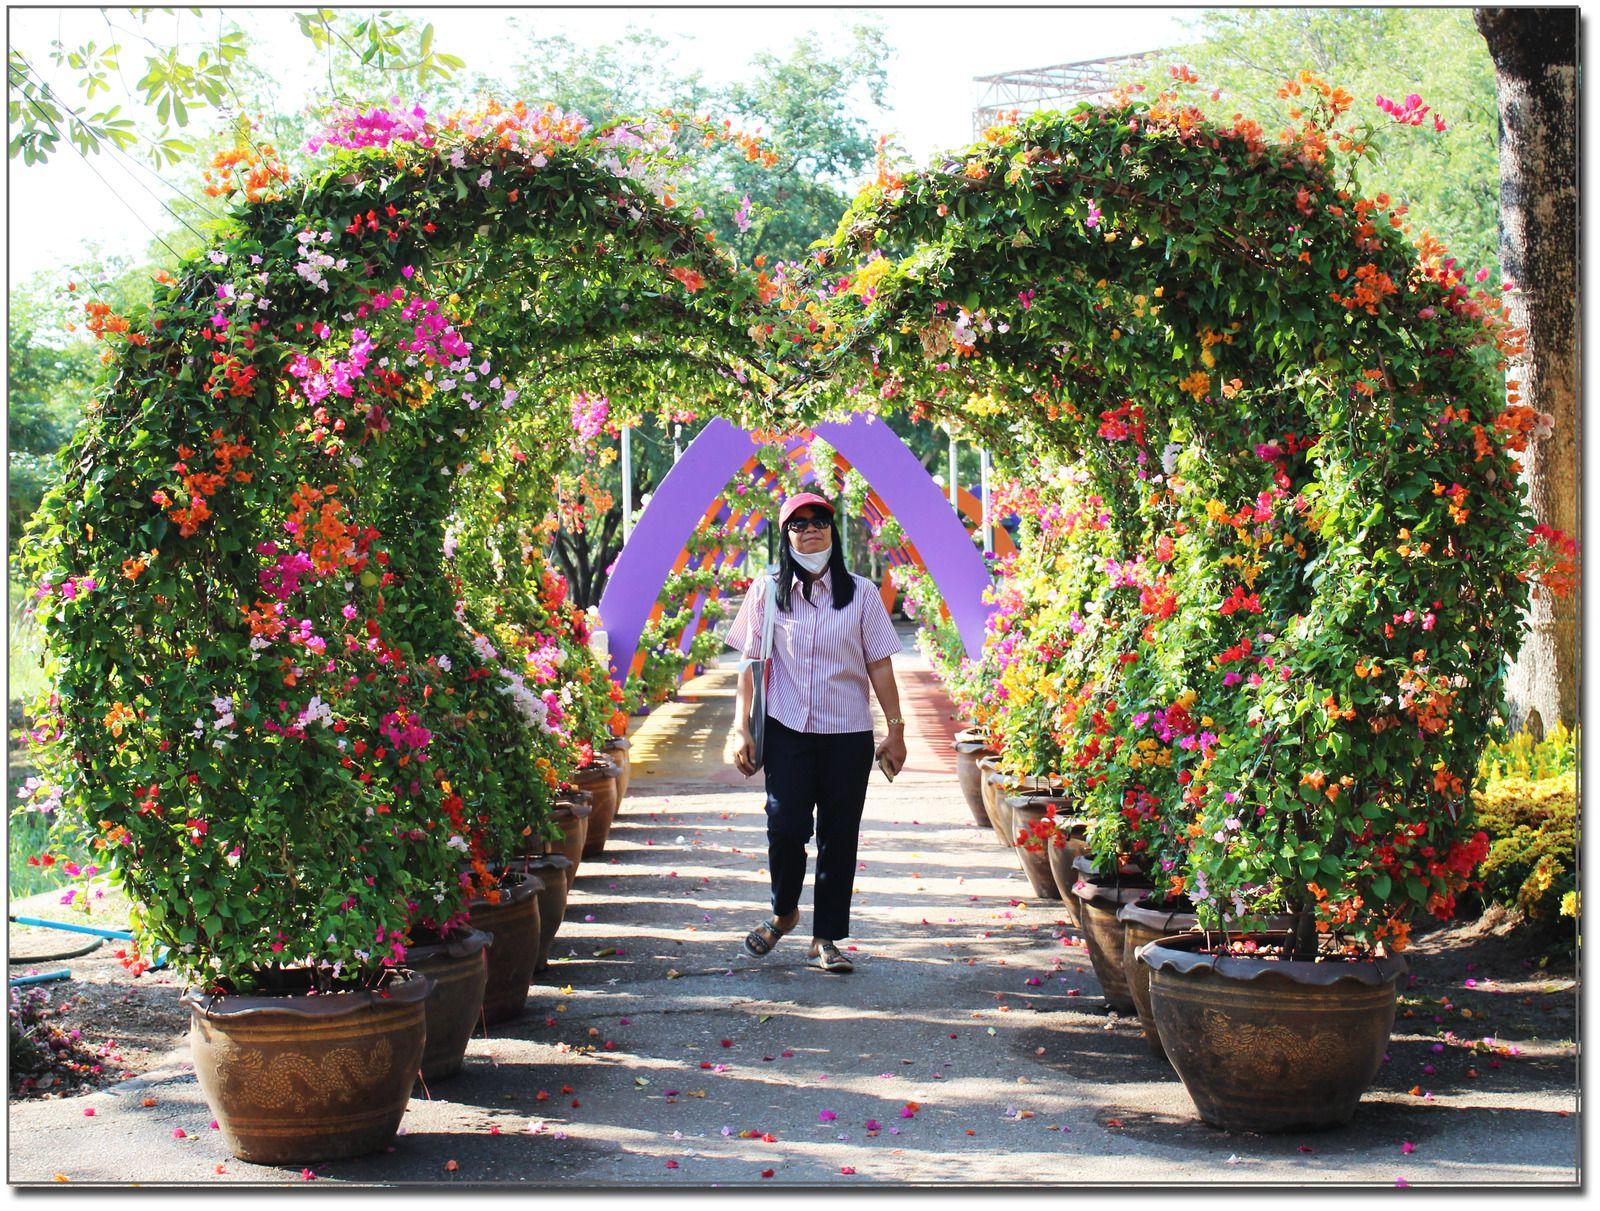 Floralies de Khon Kaen (Thaïlande)